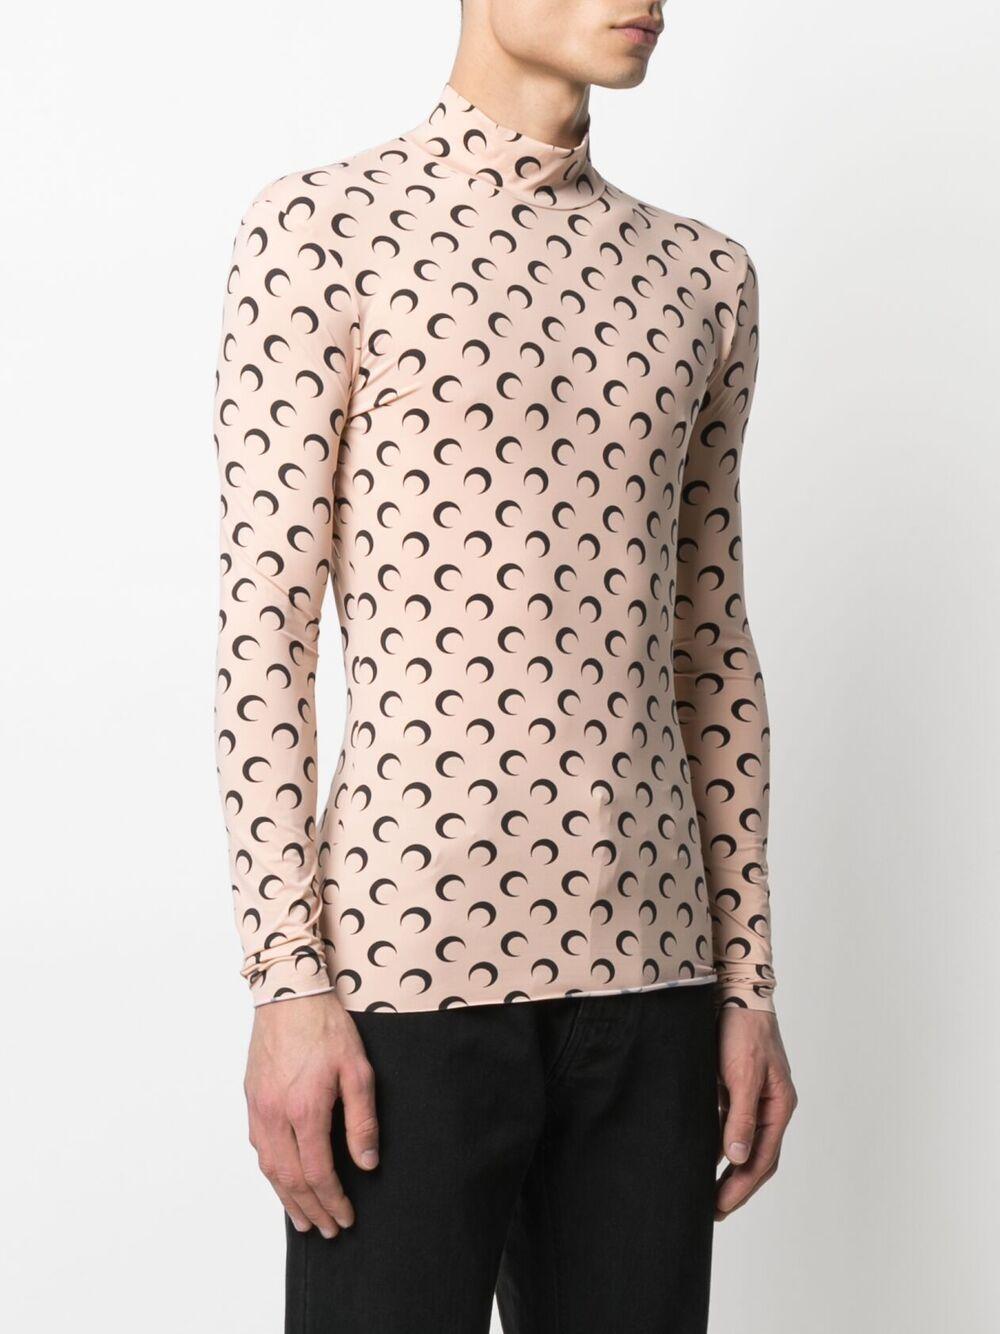 MOON TOP TURTLENECK MARINE SERRE | T-shirts | T088ICONM-JERPA000109